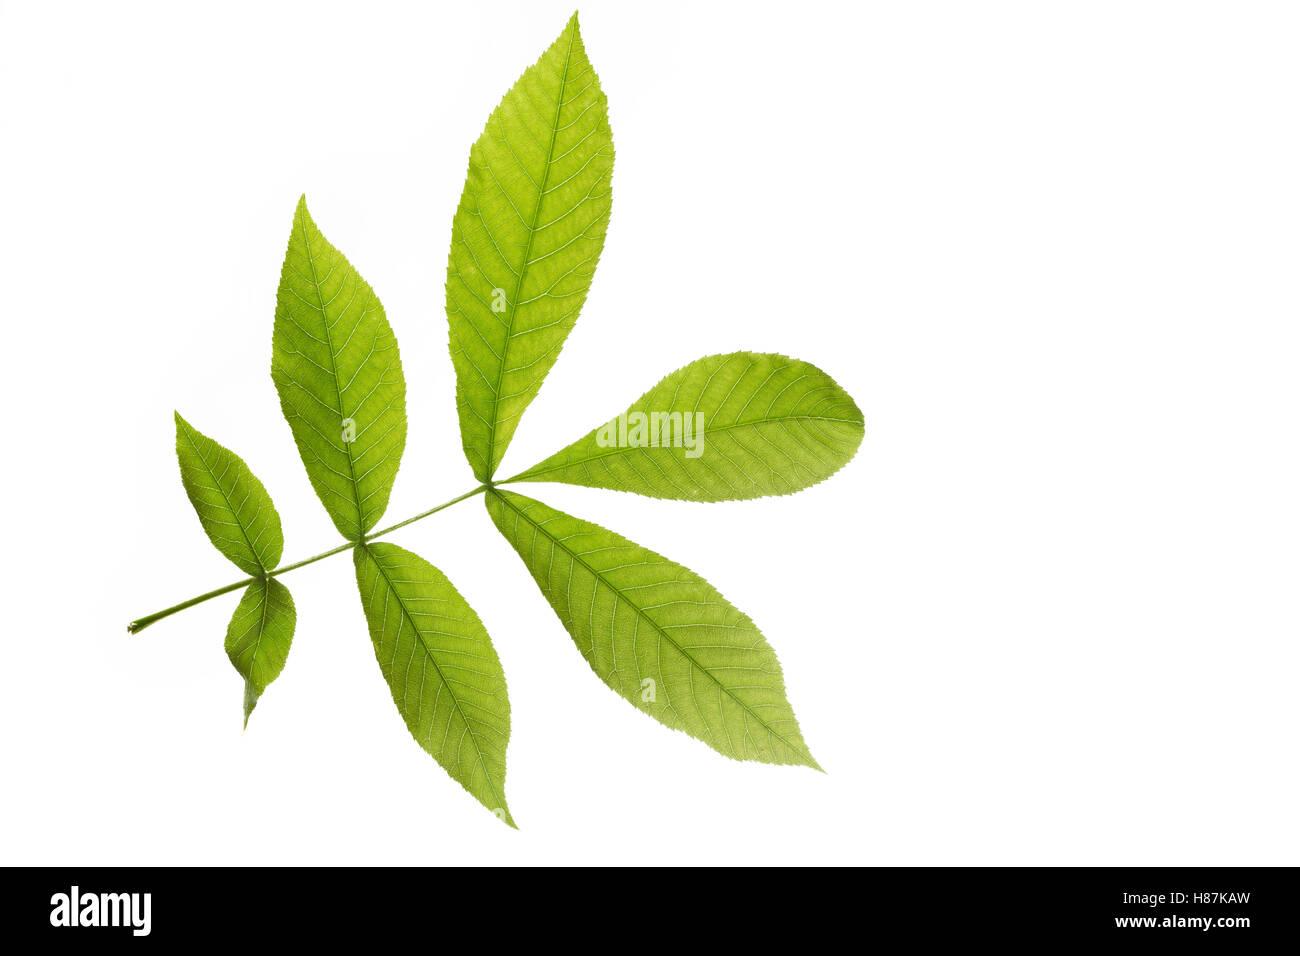 Bitternuss, Bitternuß, Carya cordiformis, bitternut hickory, Le Caryer cordiforme. Blatt, Blätter, leaf, - Stock Image